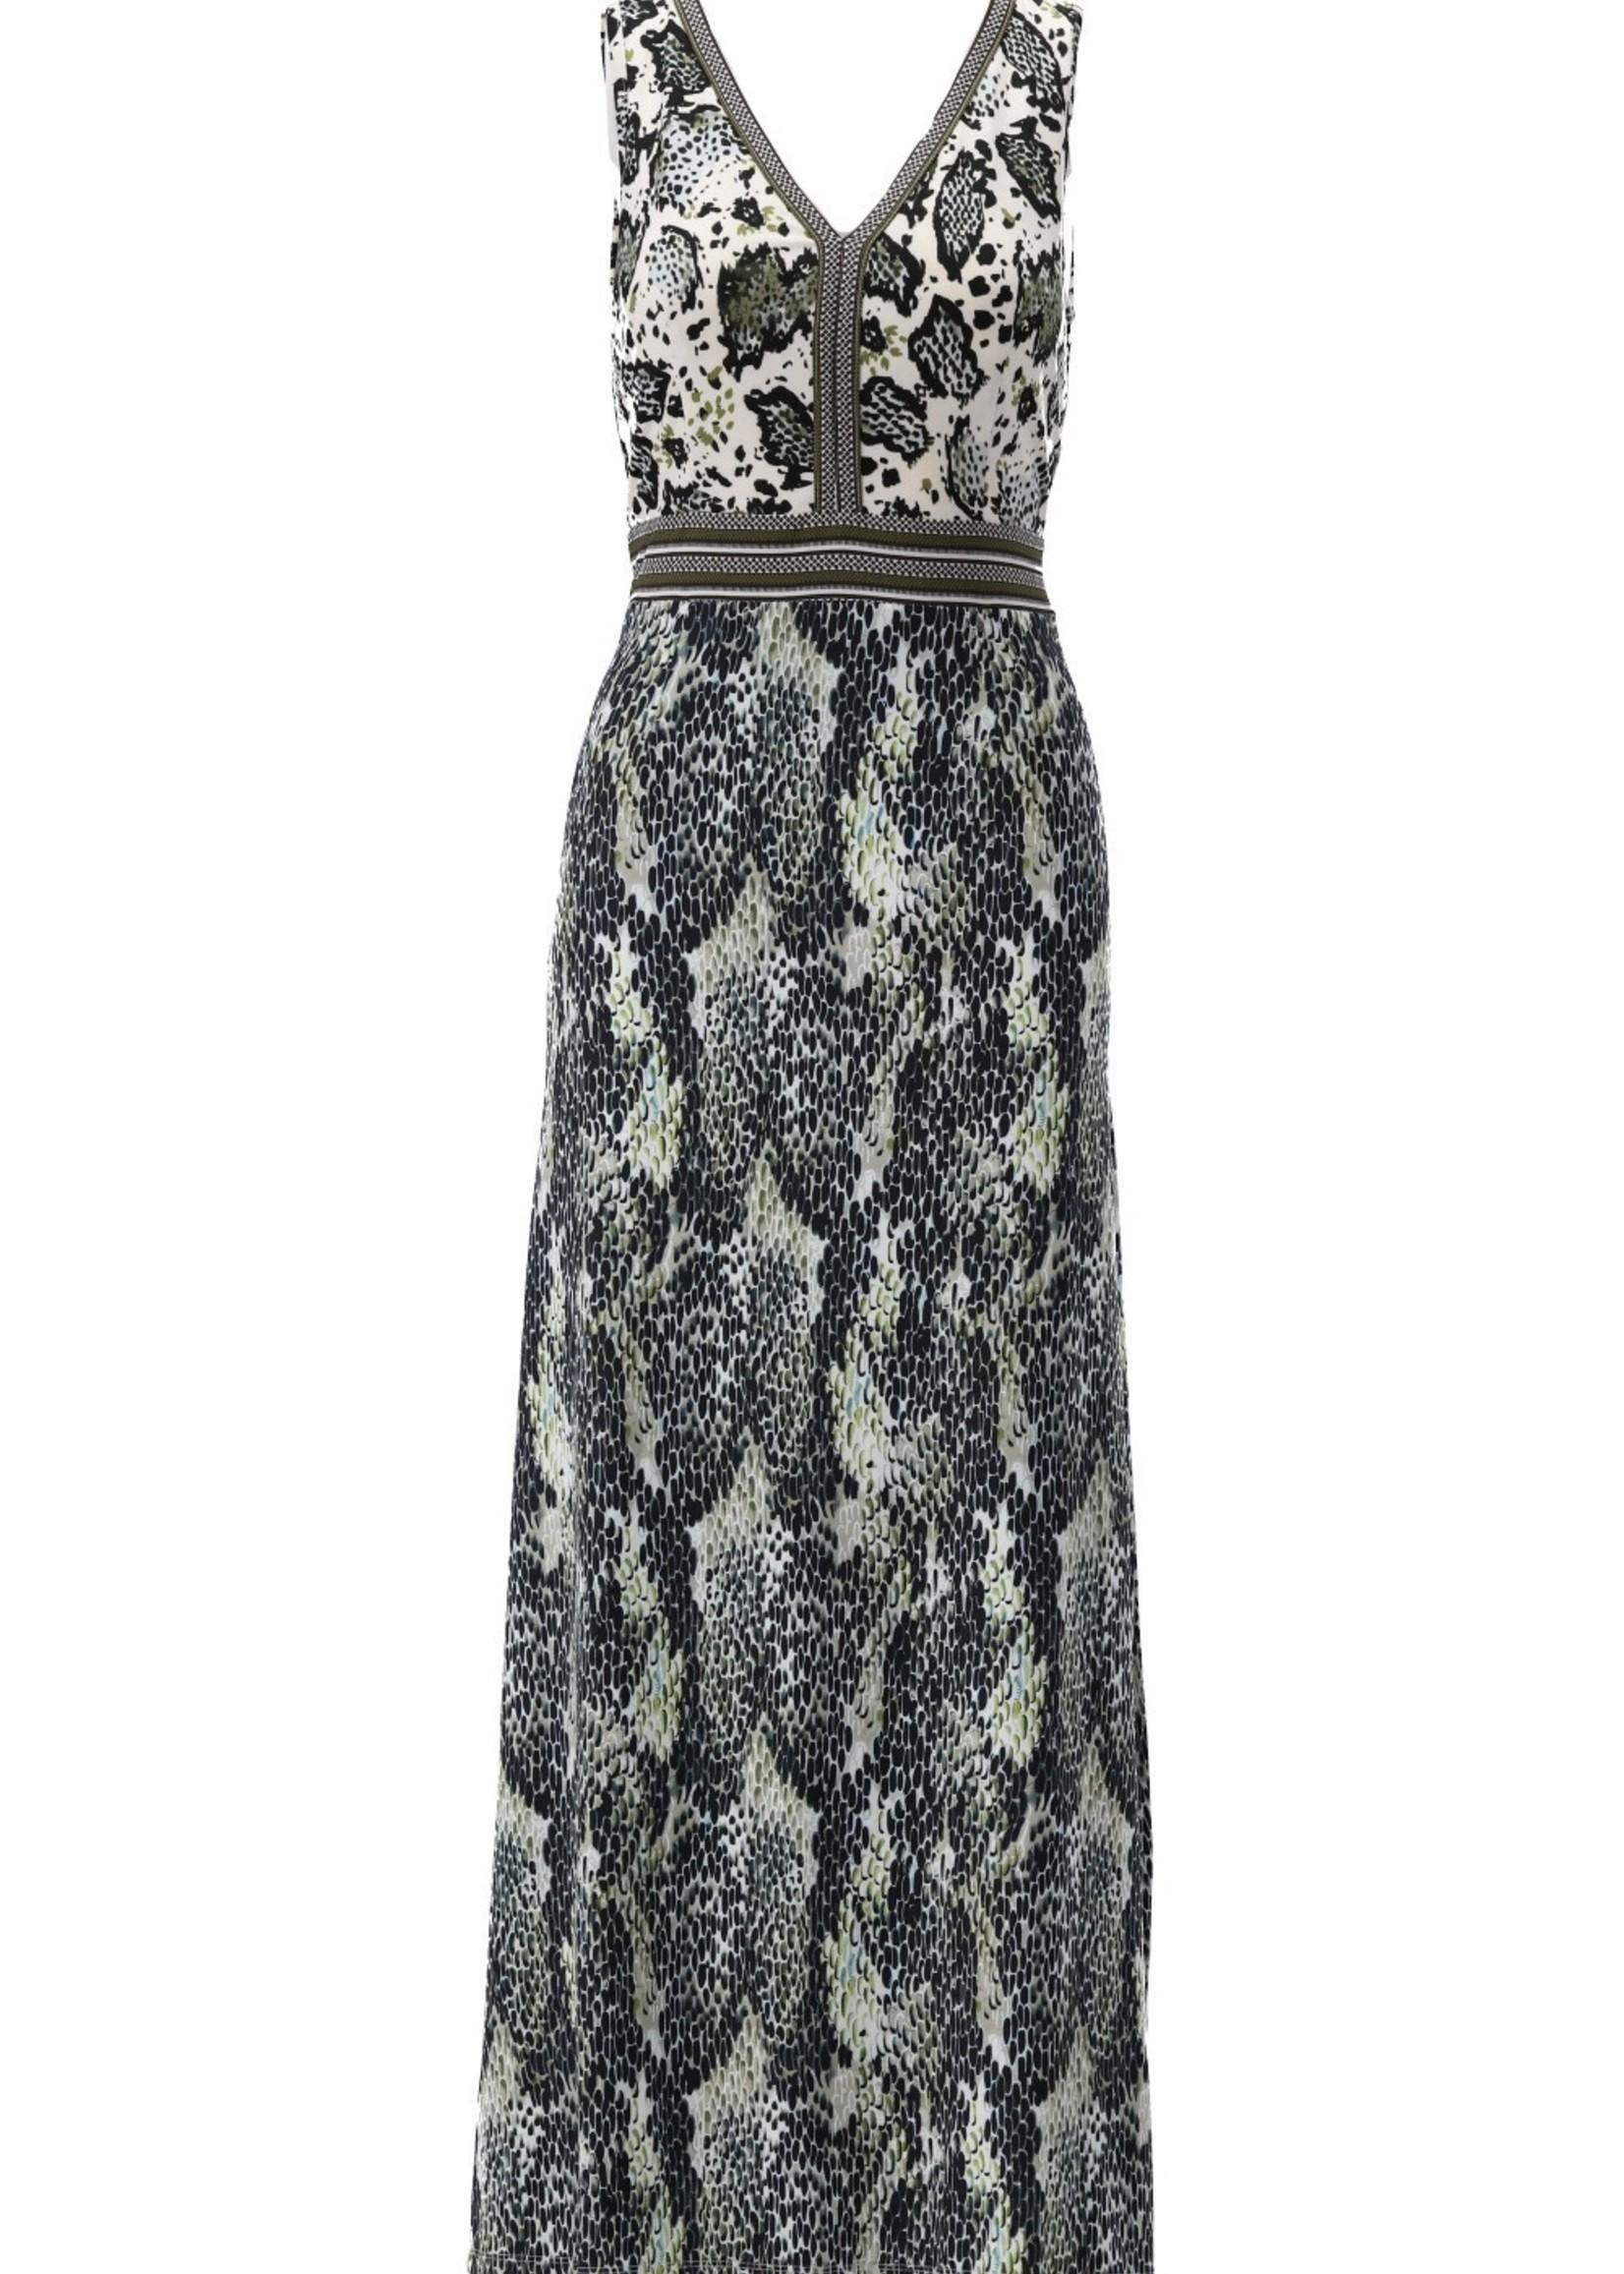 Kdesign Maxi dress snake S886 P172